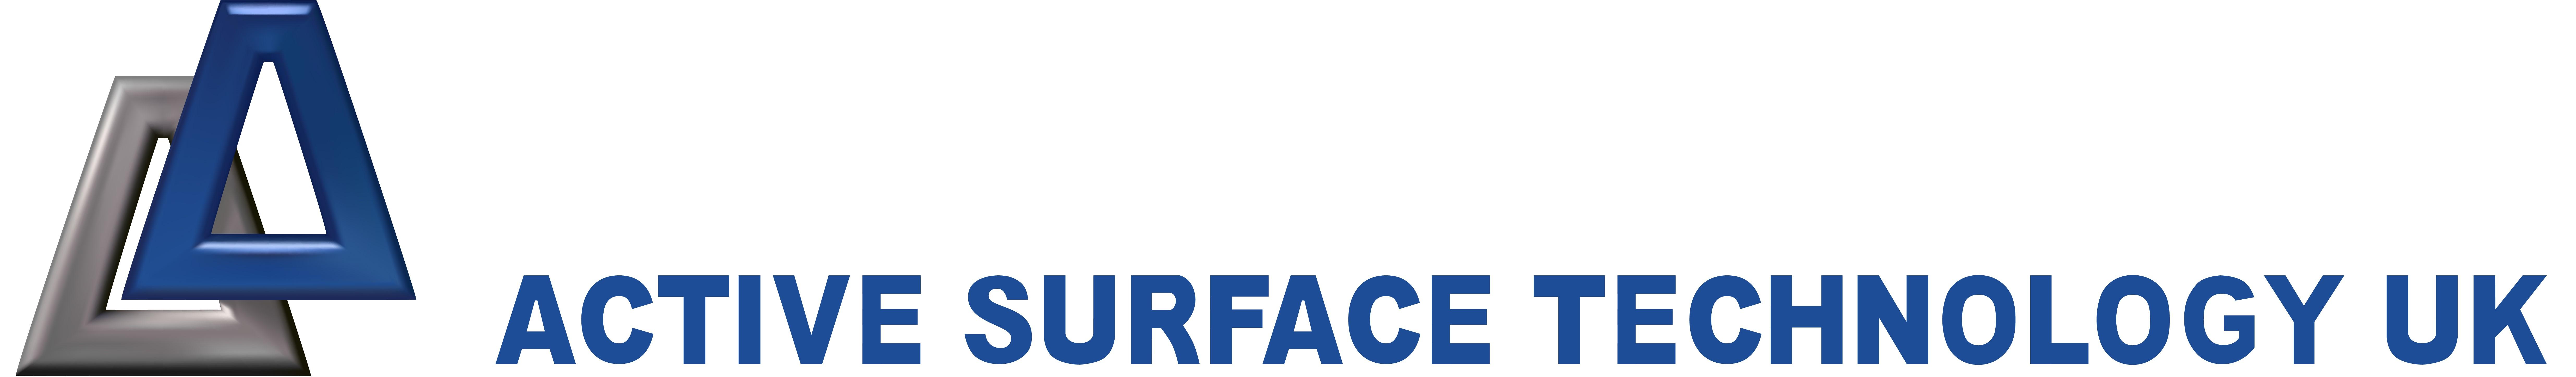 ACTIVE SURFACE TECHNOLOGY UK Ltd